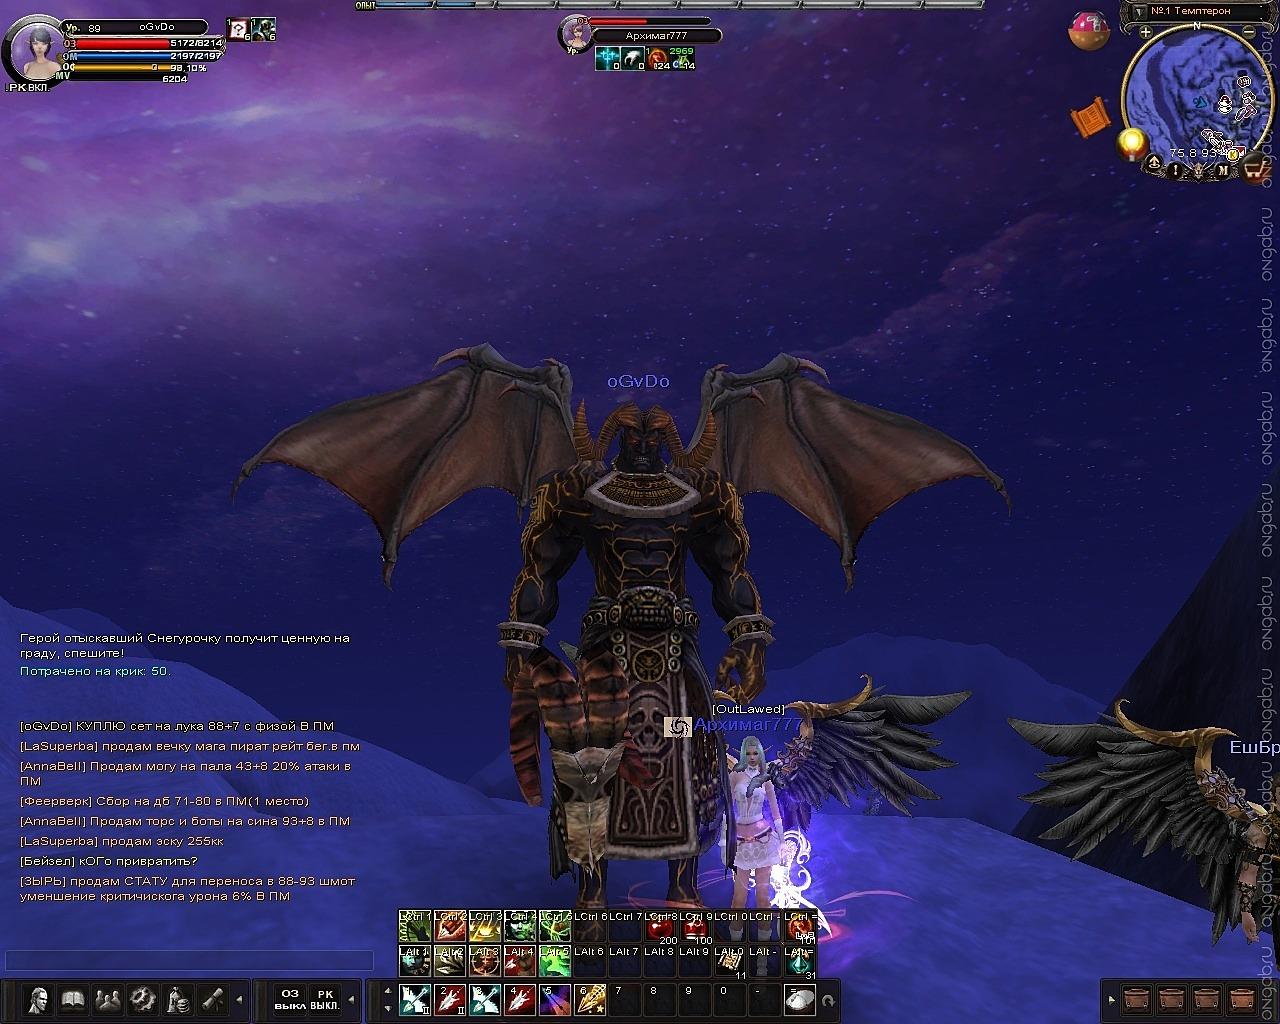 Скриншот Карос: Начало #288148